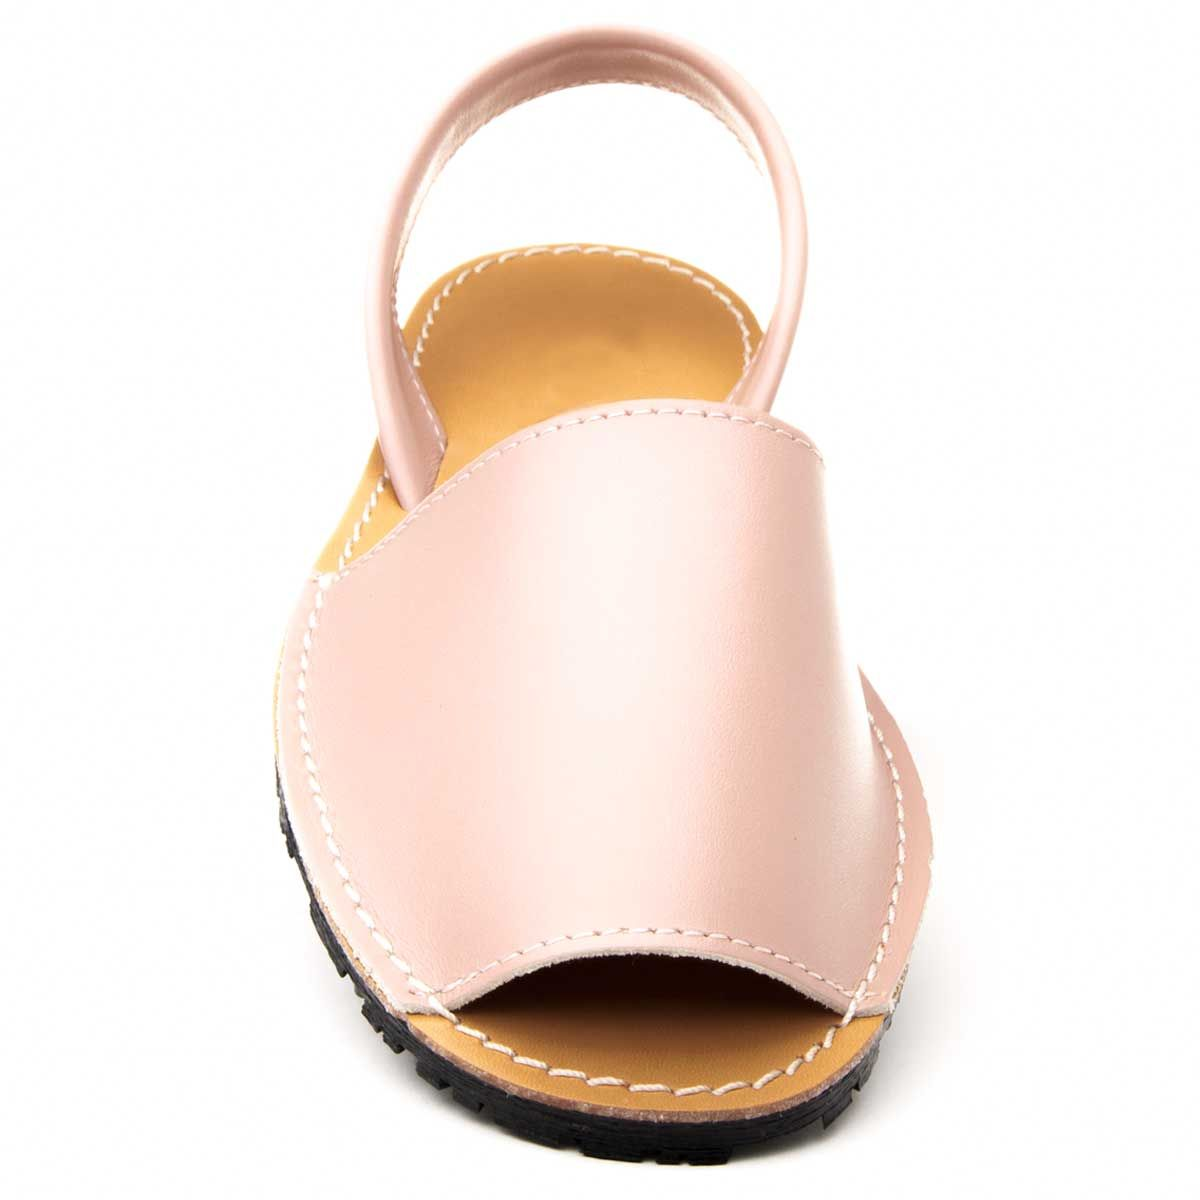 Purapiel Slingback Flat Sandal in Pink